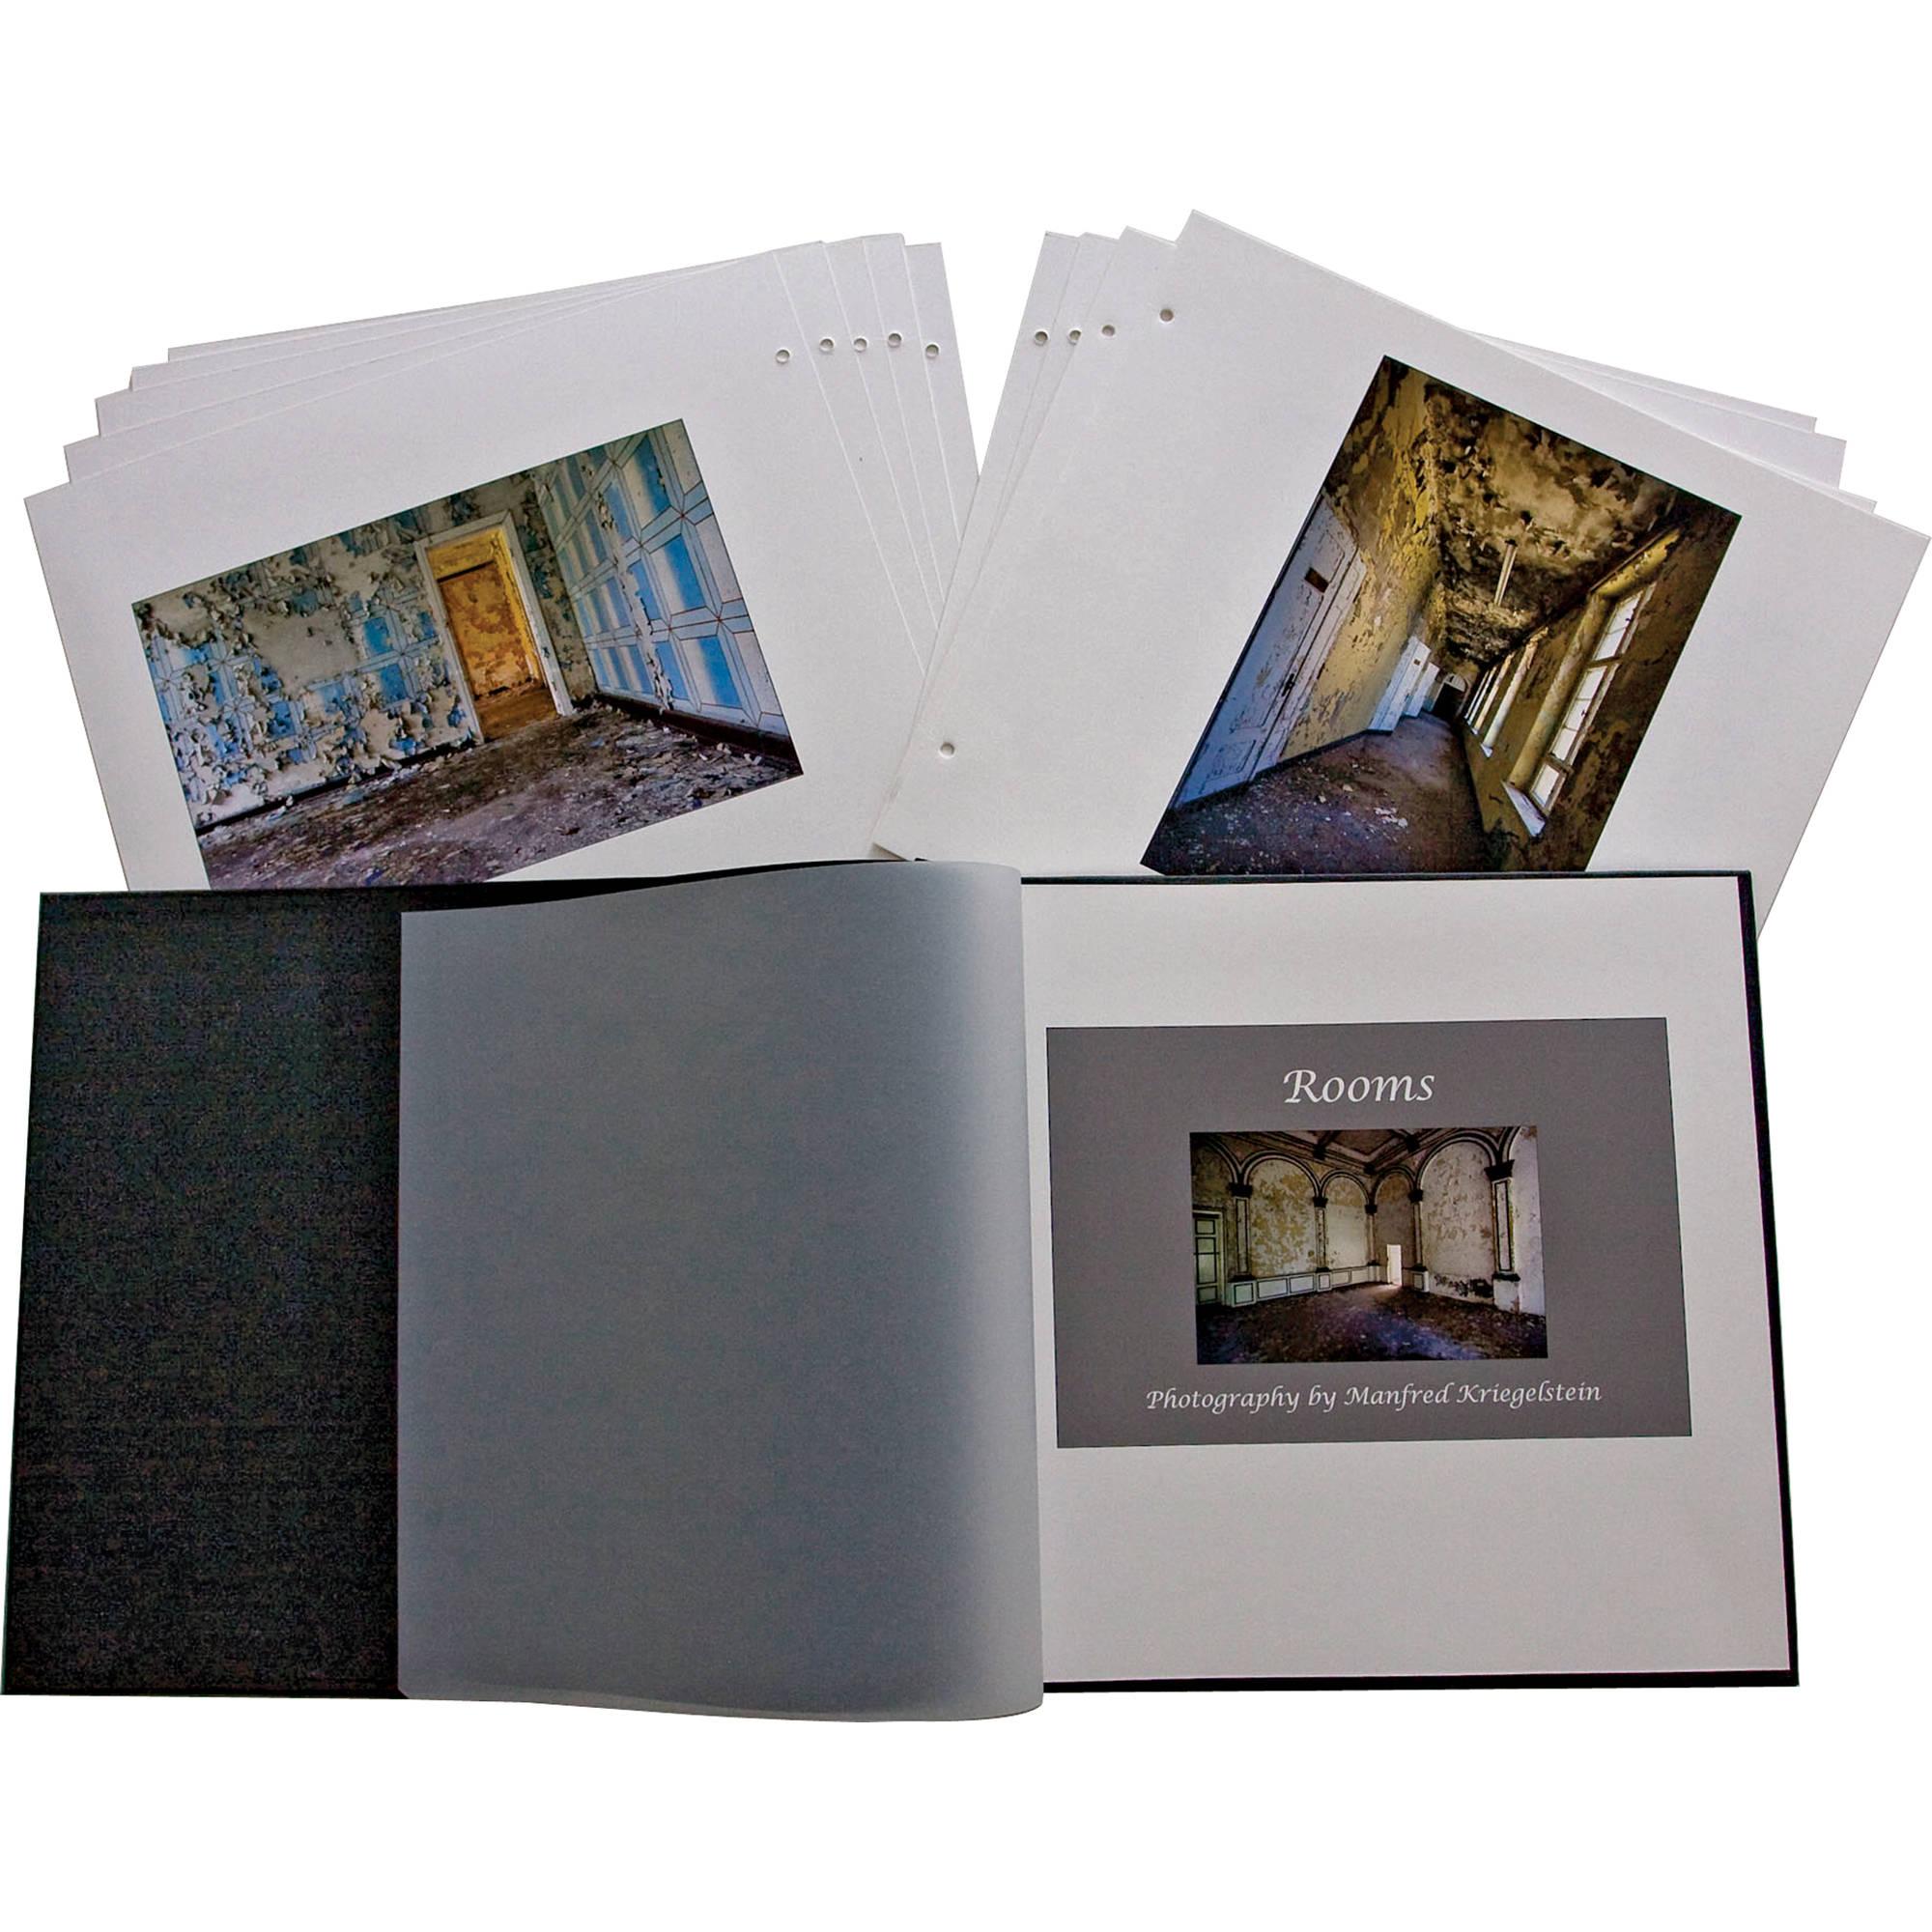 Hahnemühle Fineart Inkjet Leather Album 12 X 12 10640857